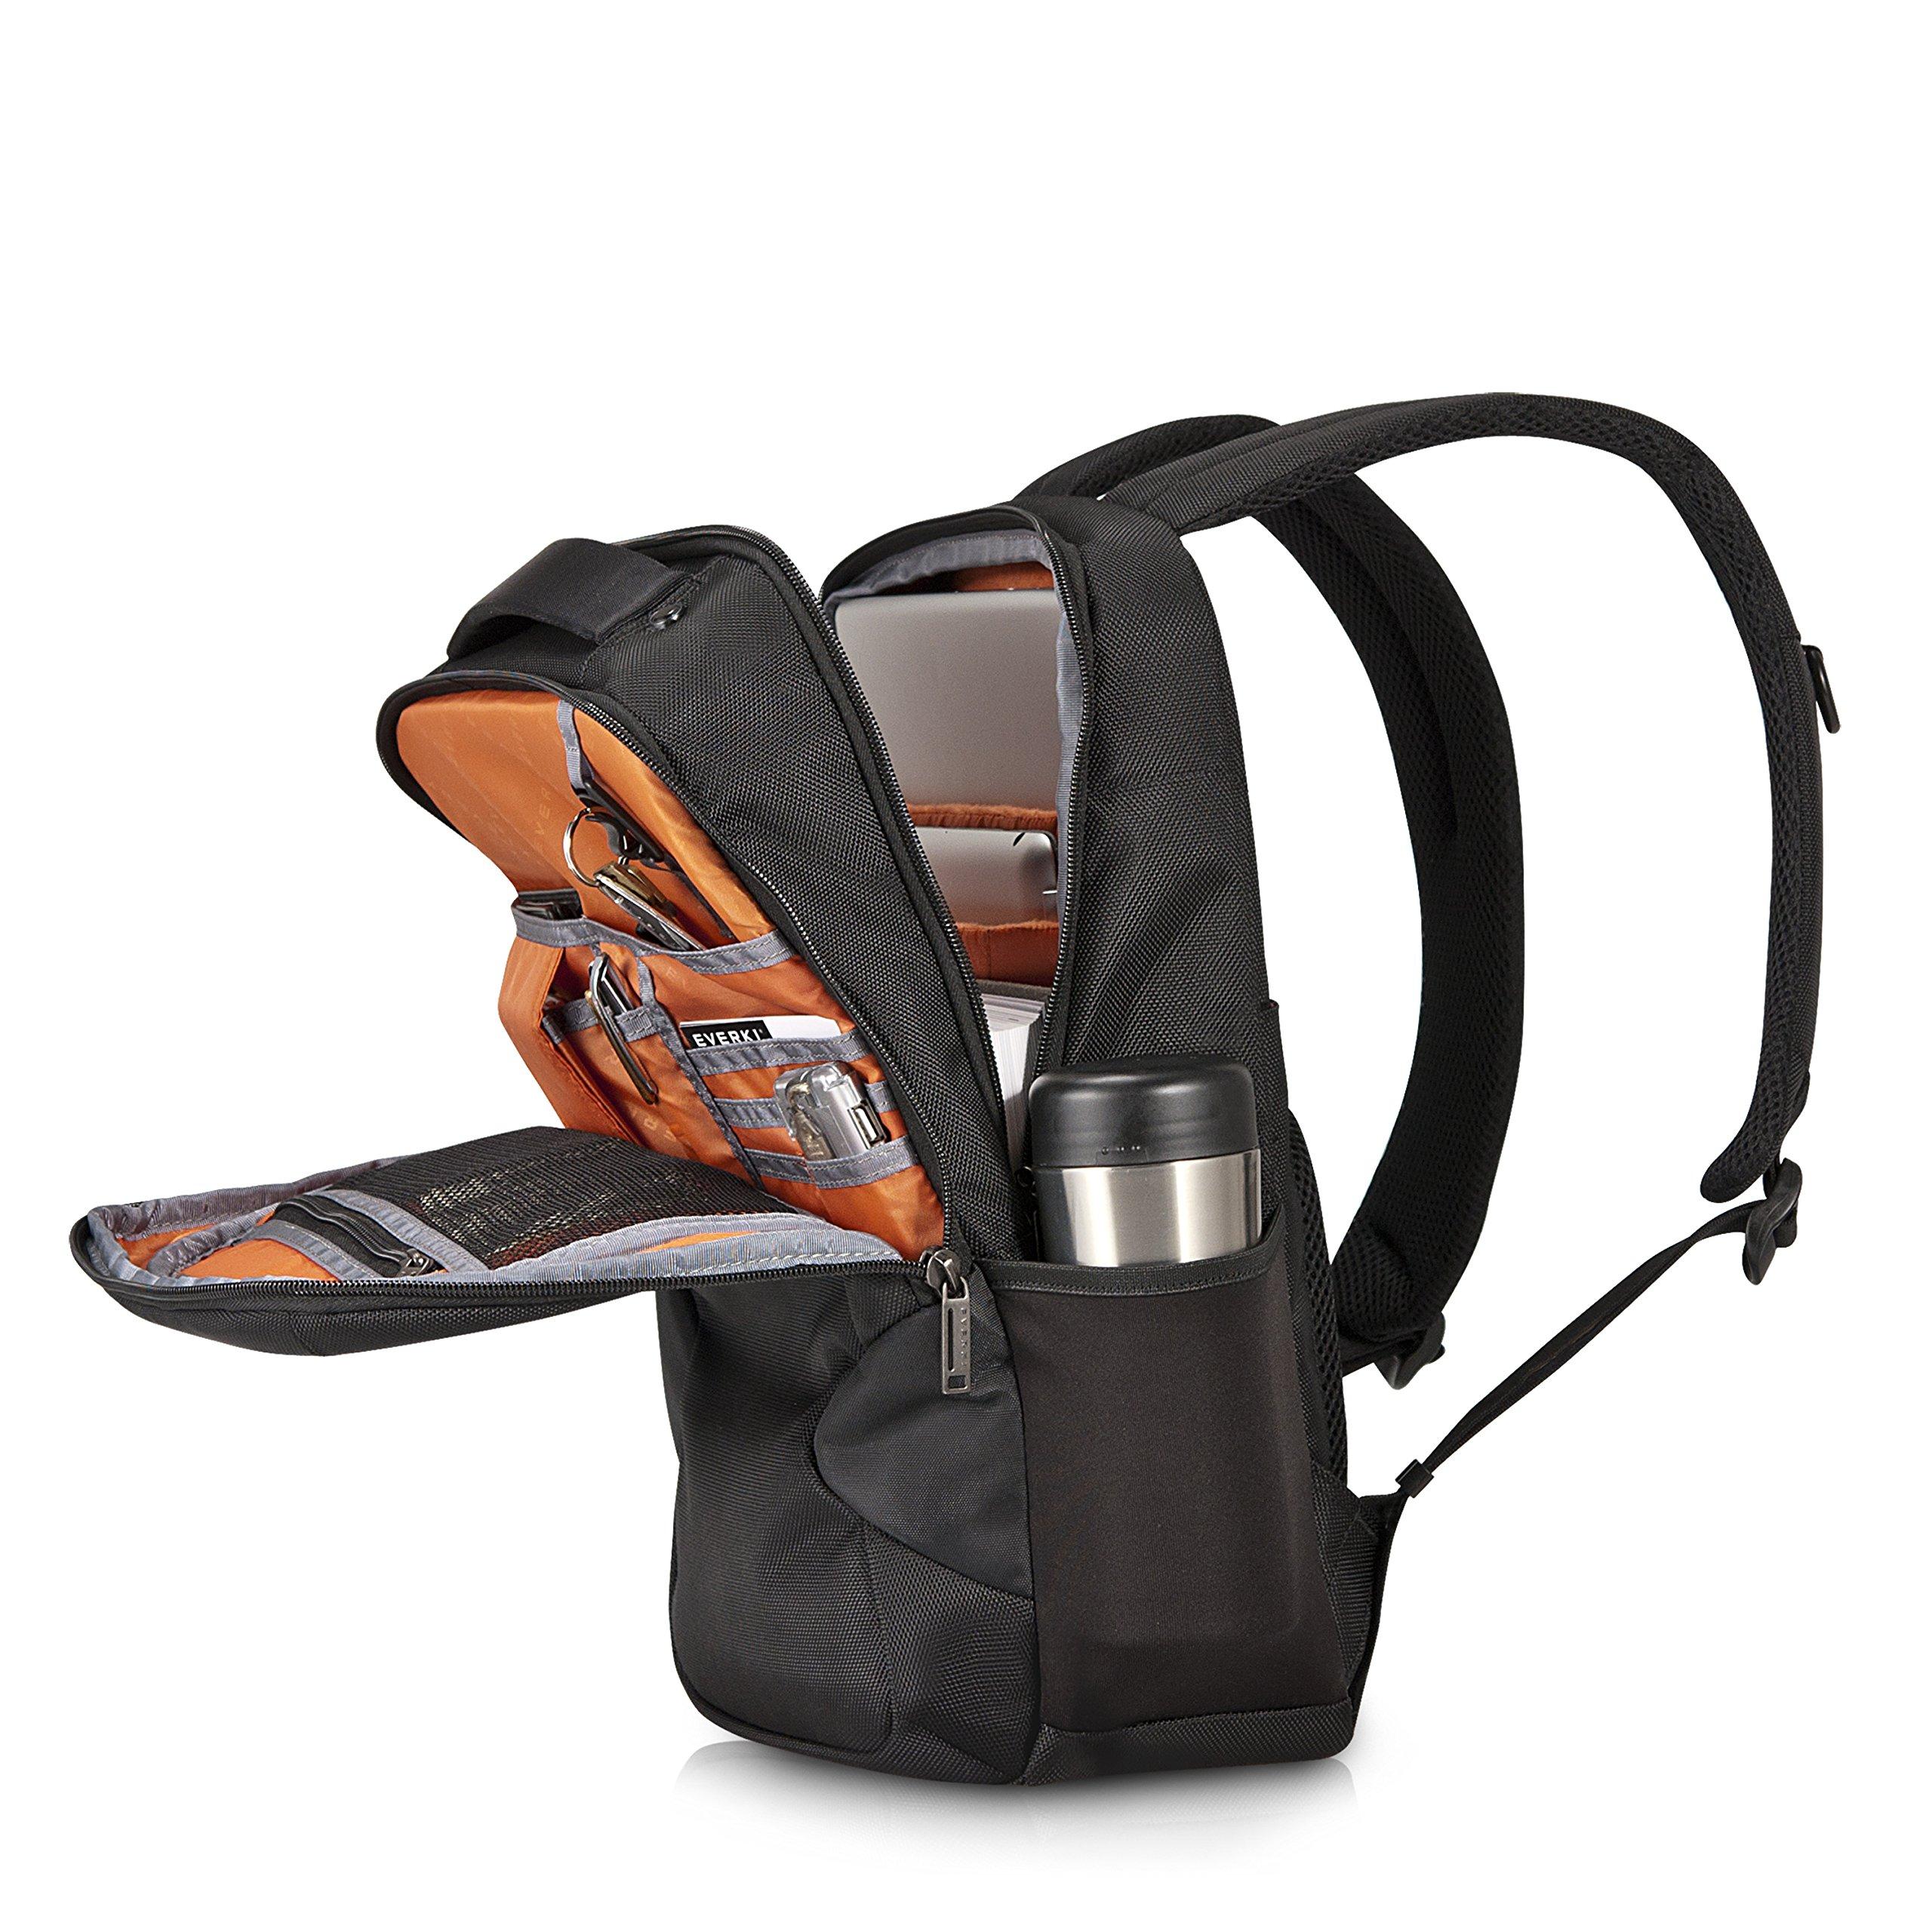 Everki Studio Slim Laptop Backpack for upto 14.1-Inch Laptops/15-Inch MacBook Pro (EKP118) by Everki (Image #2)